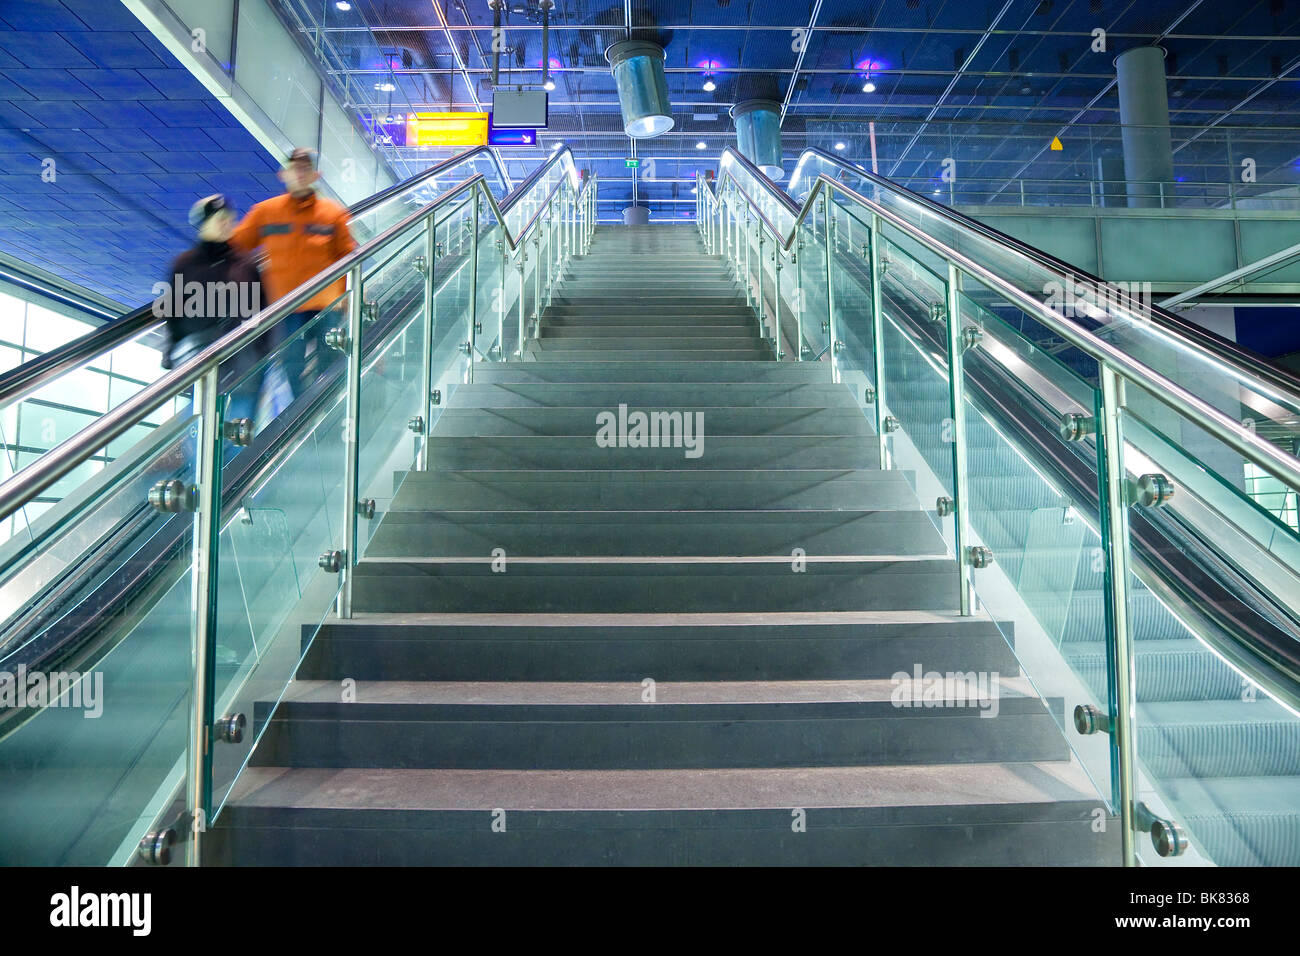 L'Europe, Allemagne, Berlin, gare moderne - escalator et escalier menant à la plate-forme. Photo Stock